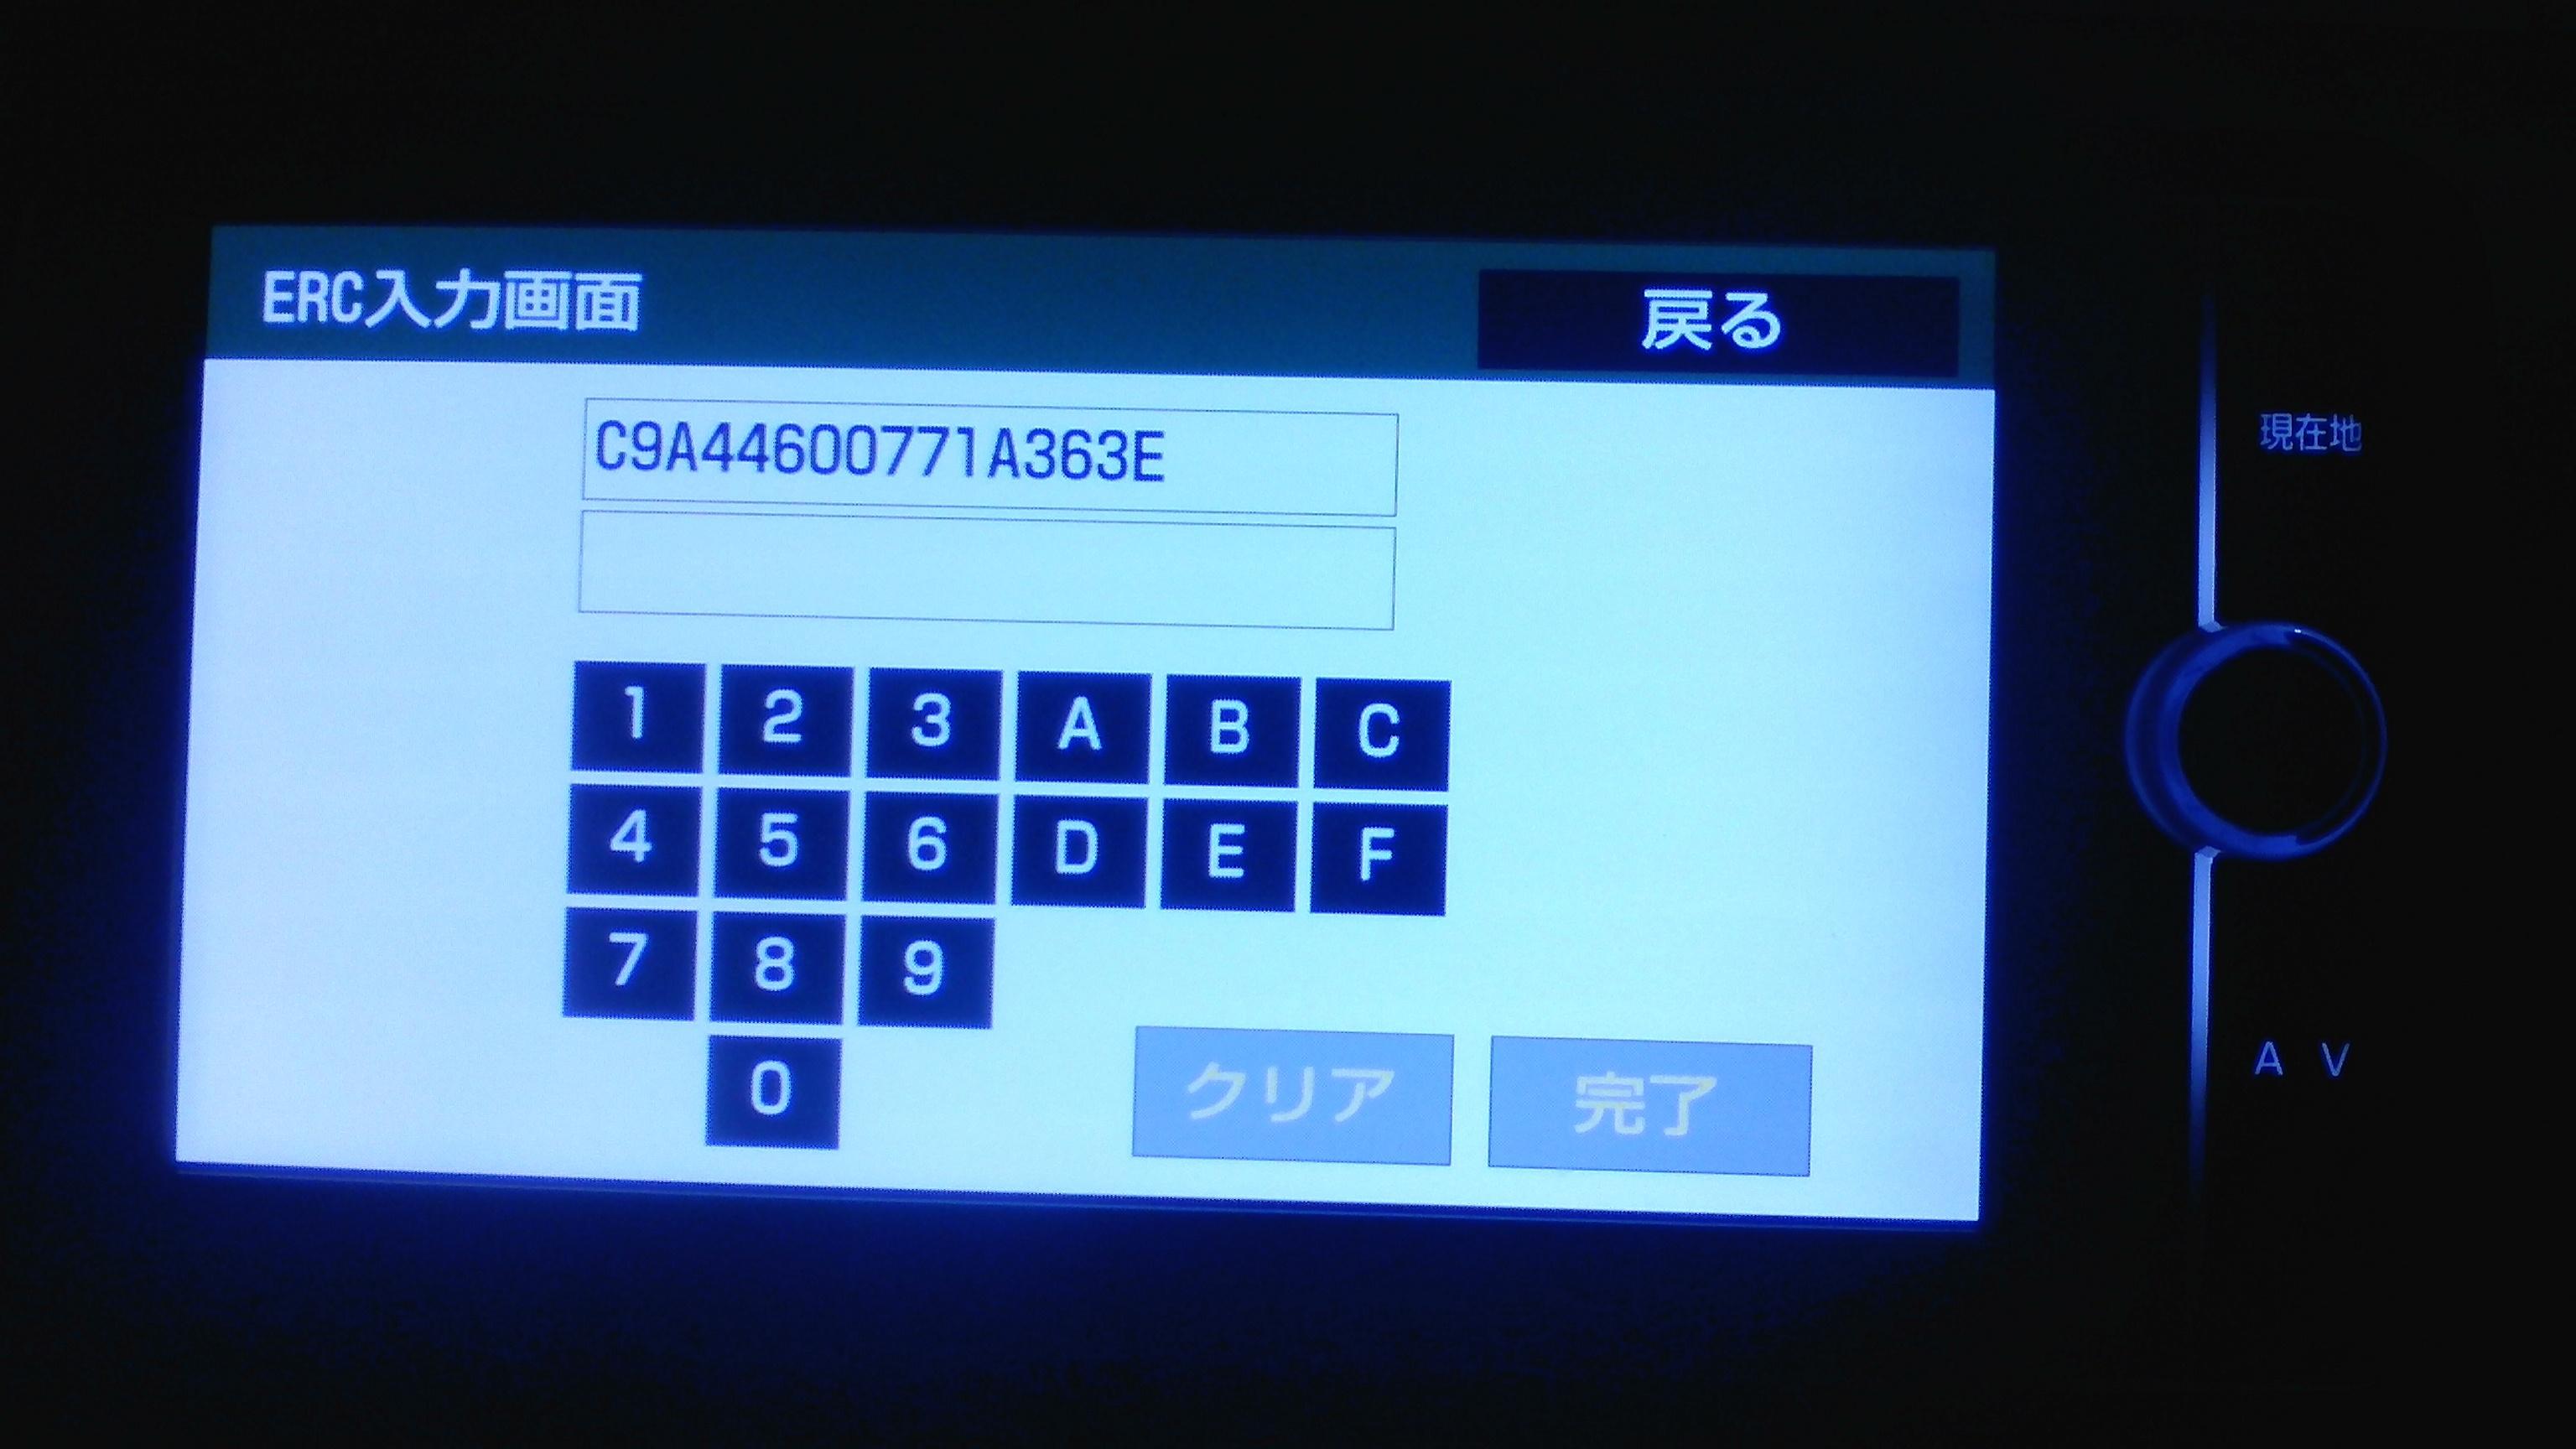 nhzn-w57 user manual